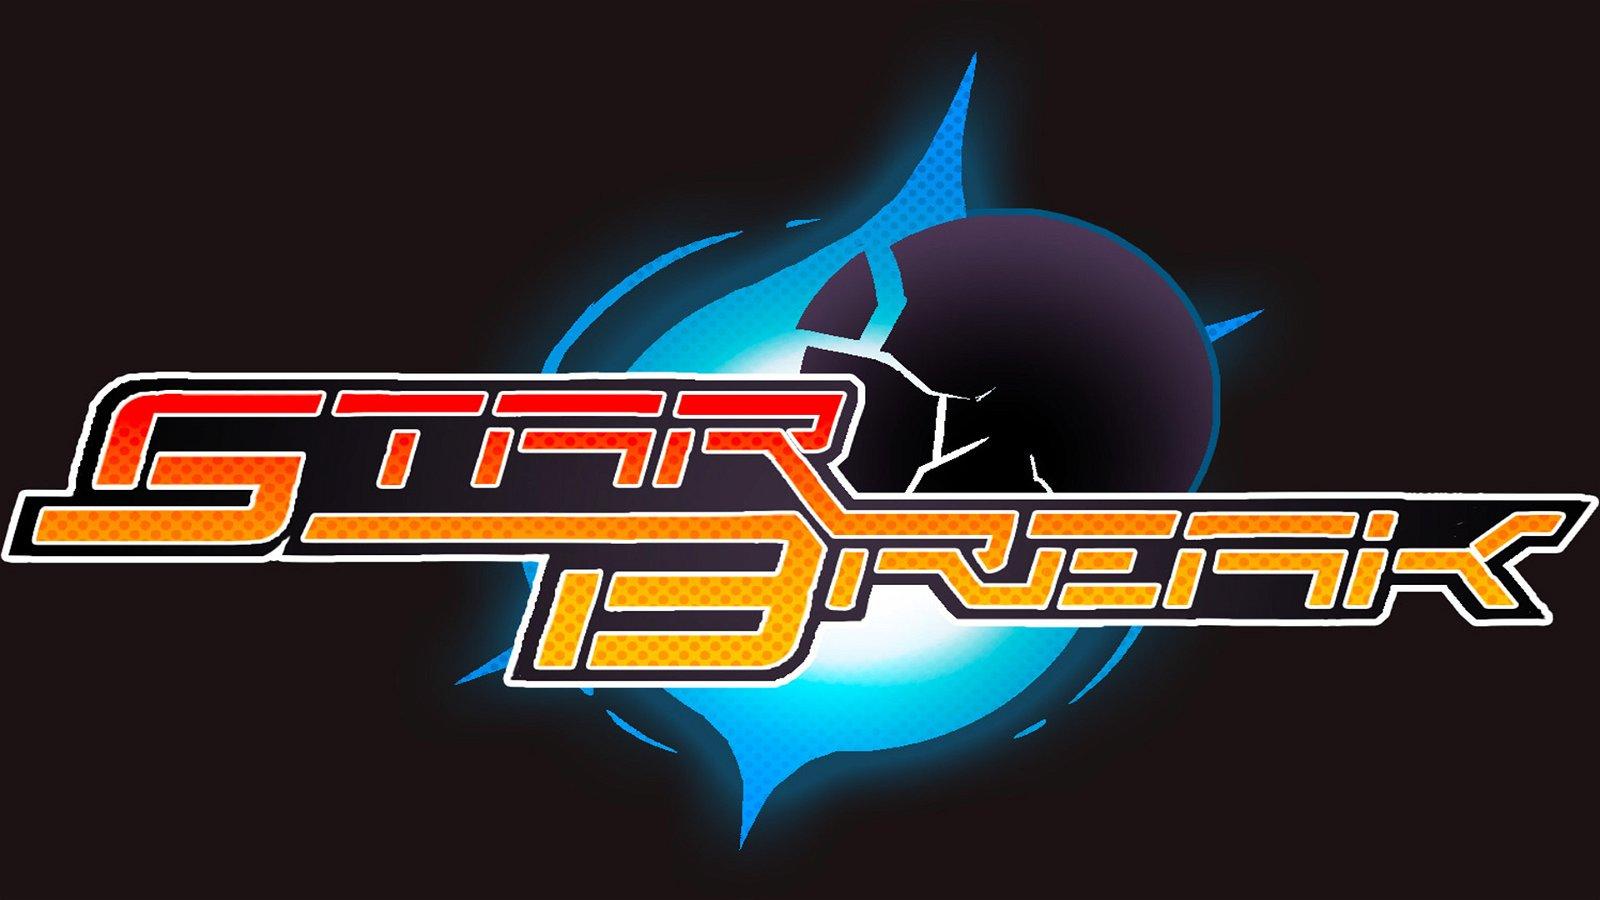 StarBreak (PC) Review